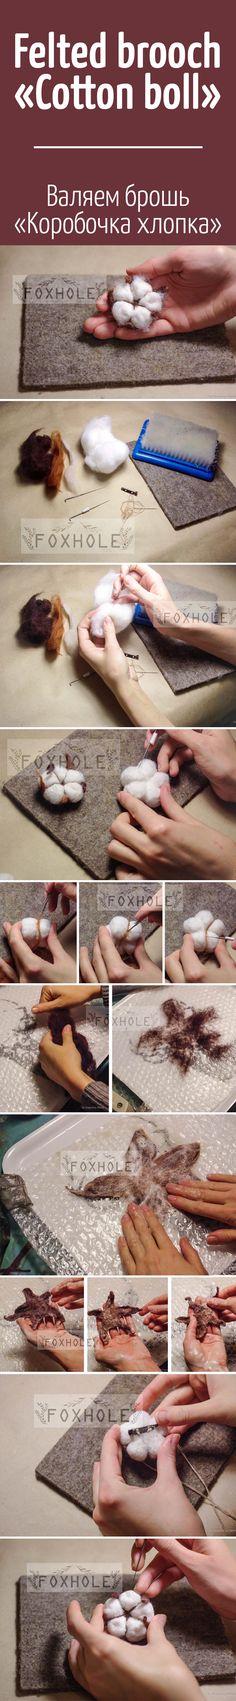 Felted brooch «Cotton boll» / Валяем брошь из шерсти — нежную коробочку хлопка